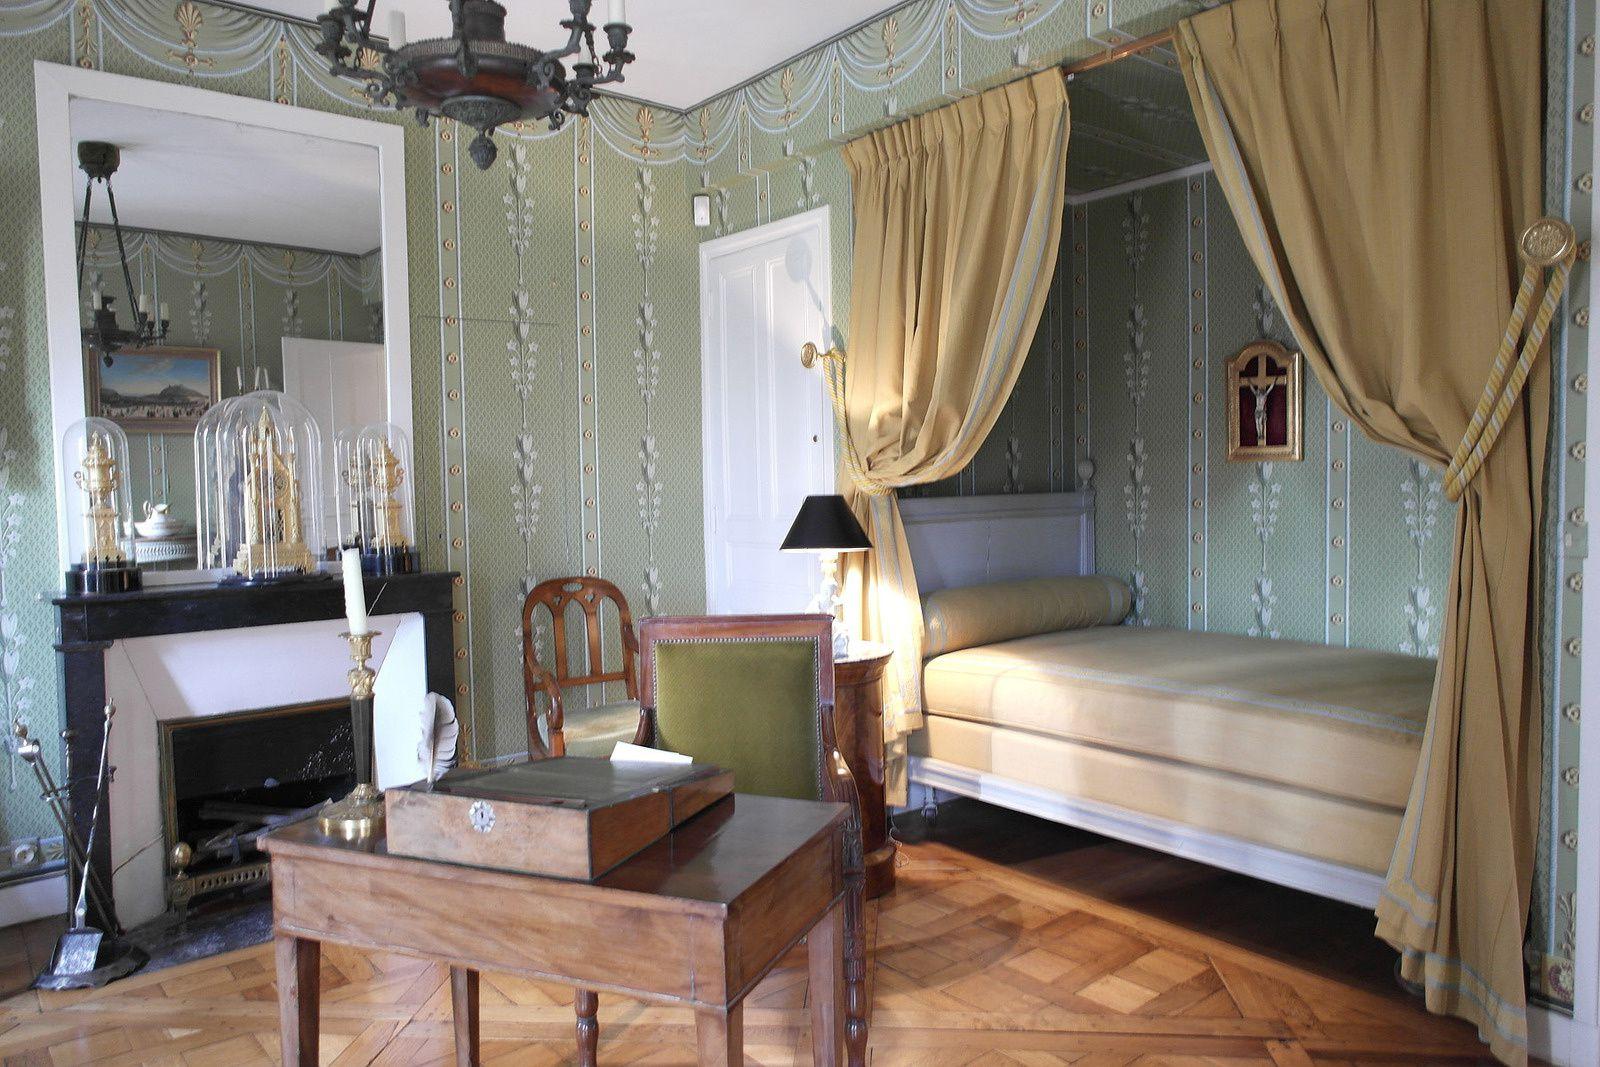 La chambre de Chateaubrriand